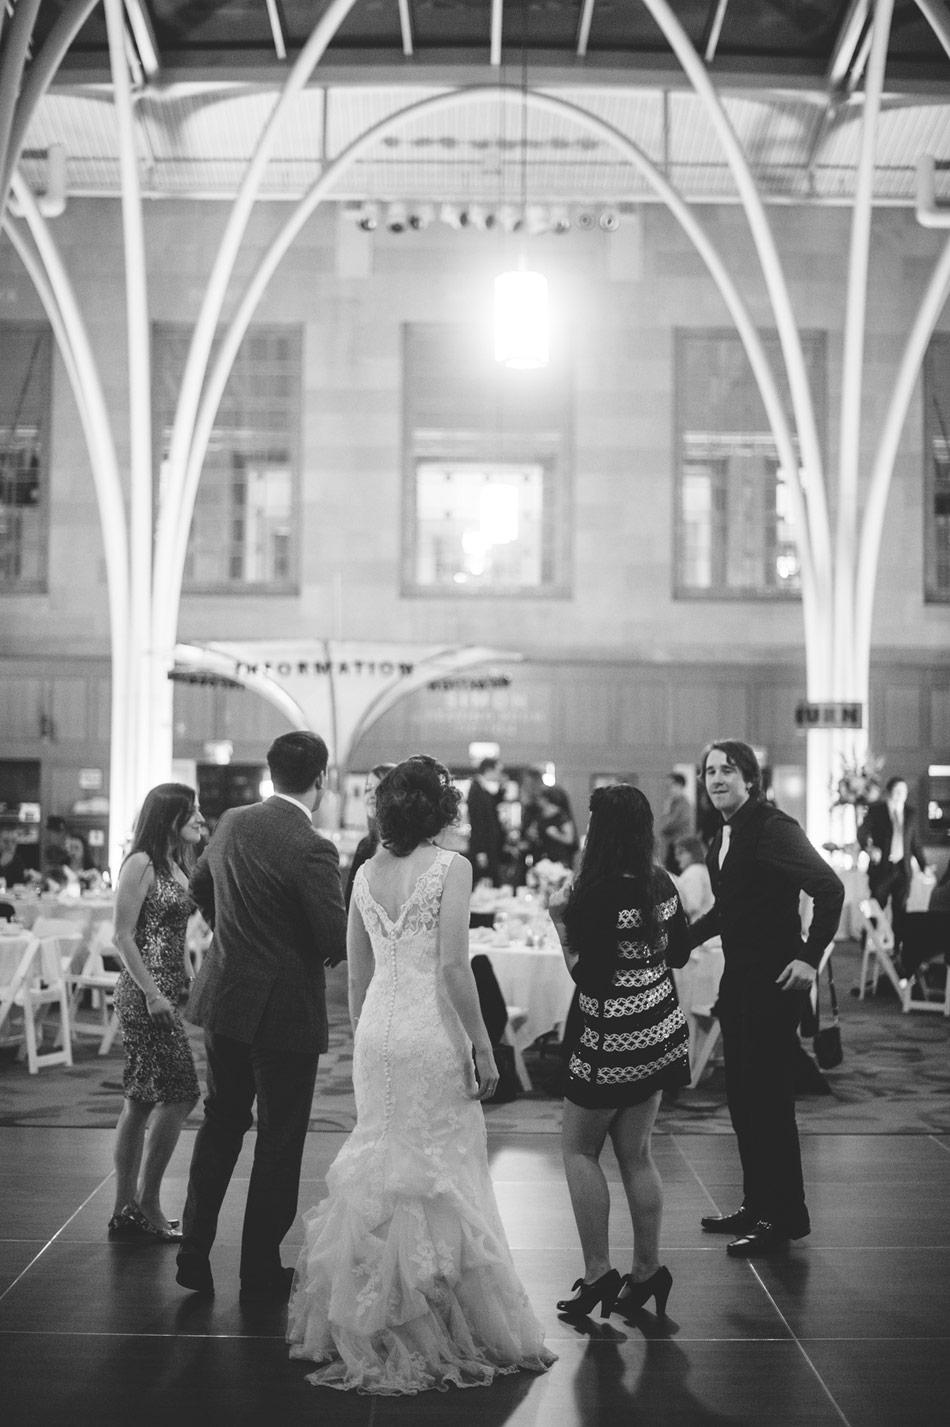 liz  u0026 james u0026 39 s indianapolis public library wedding